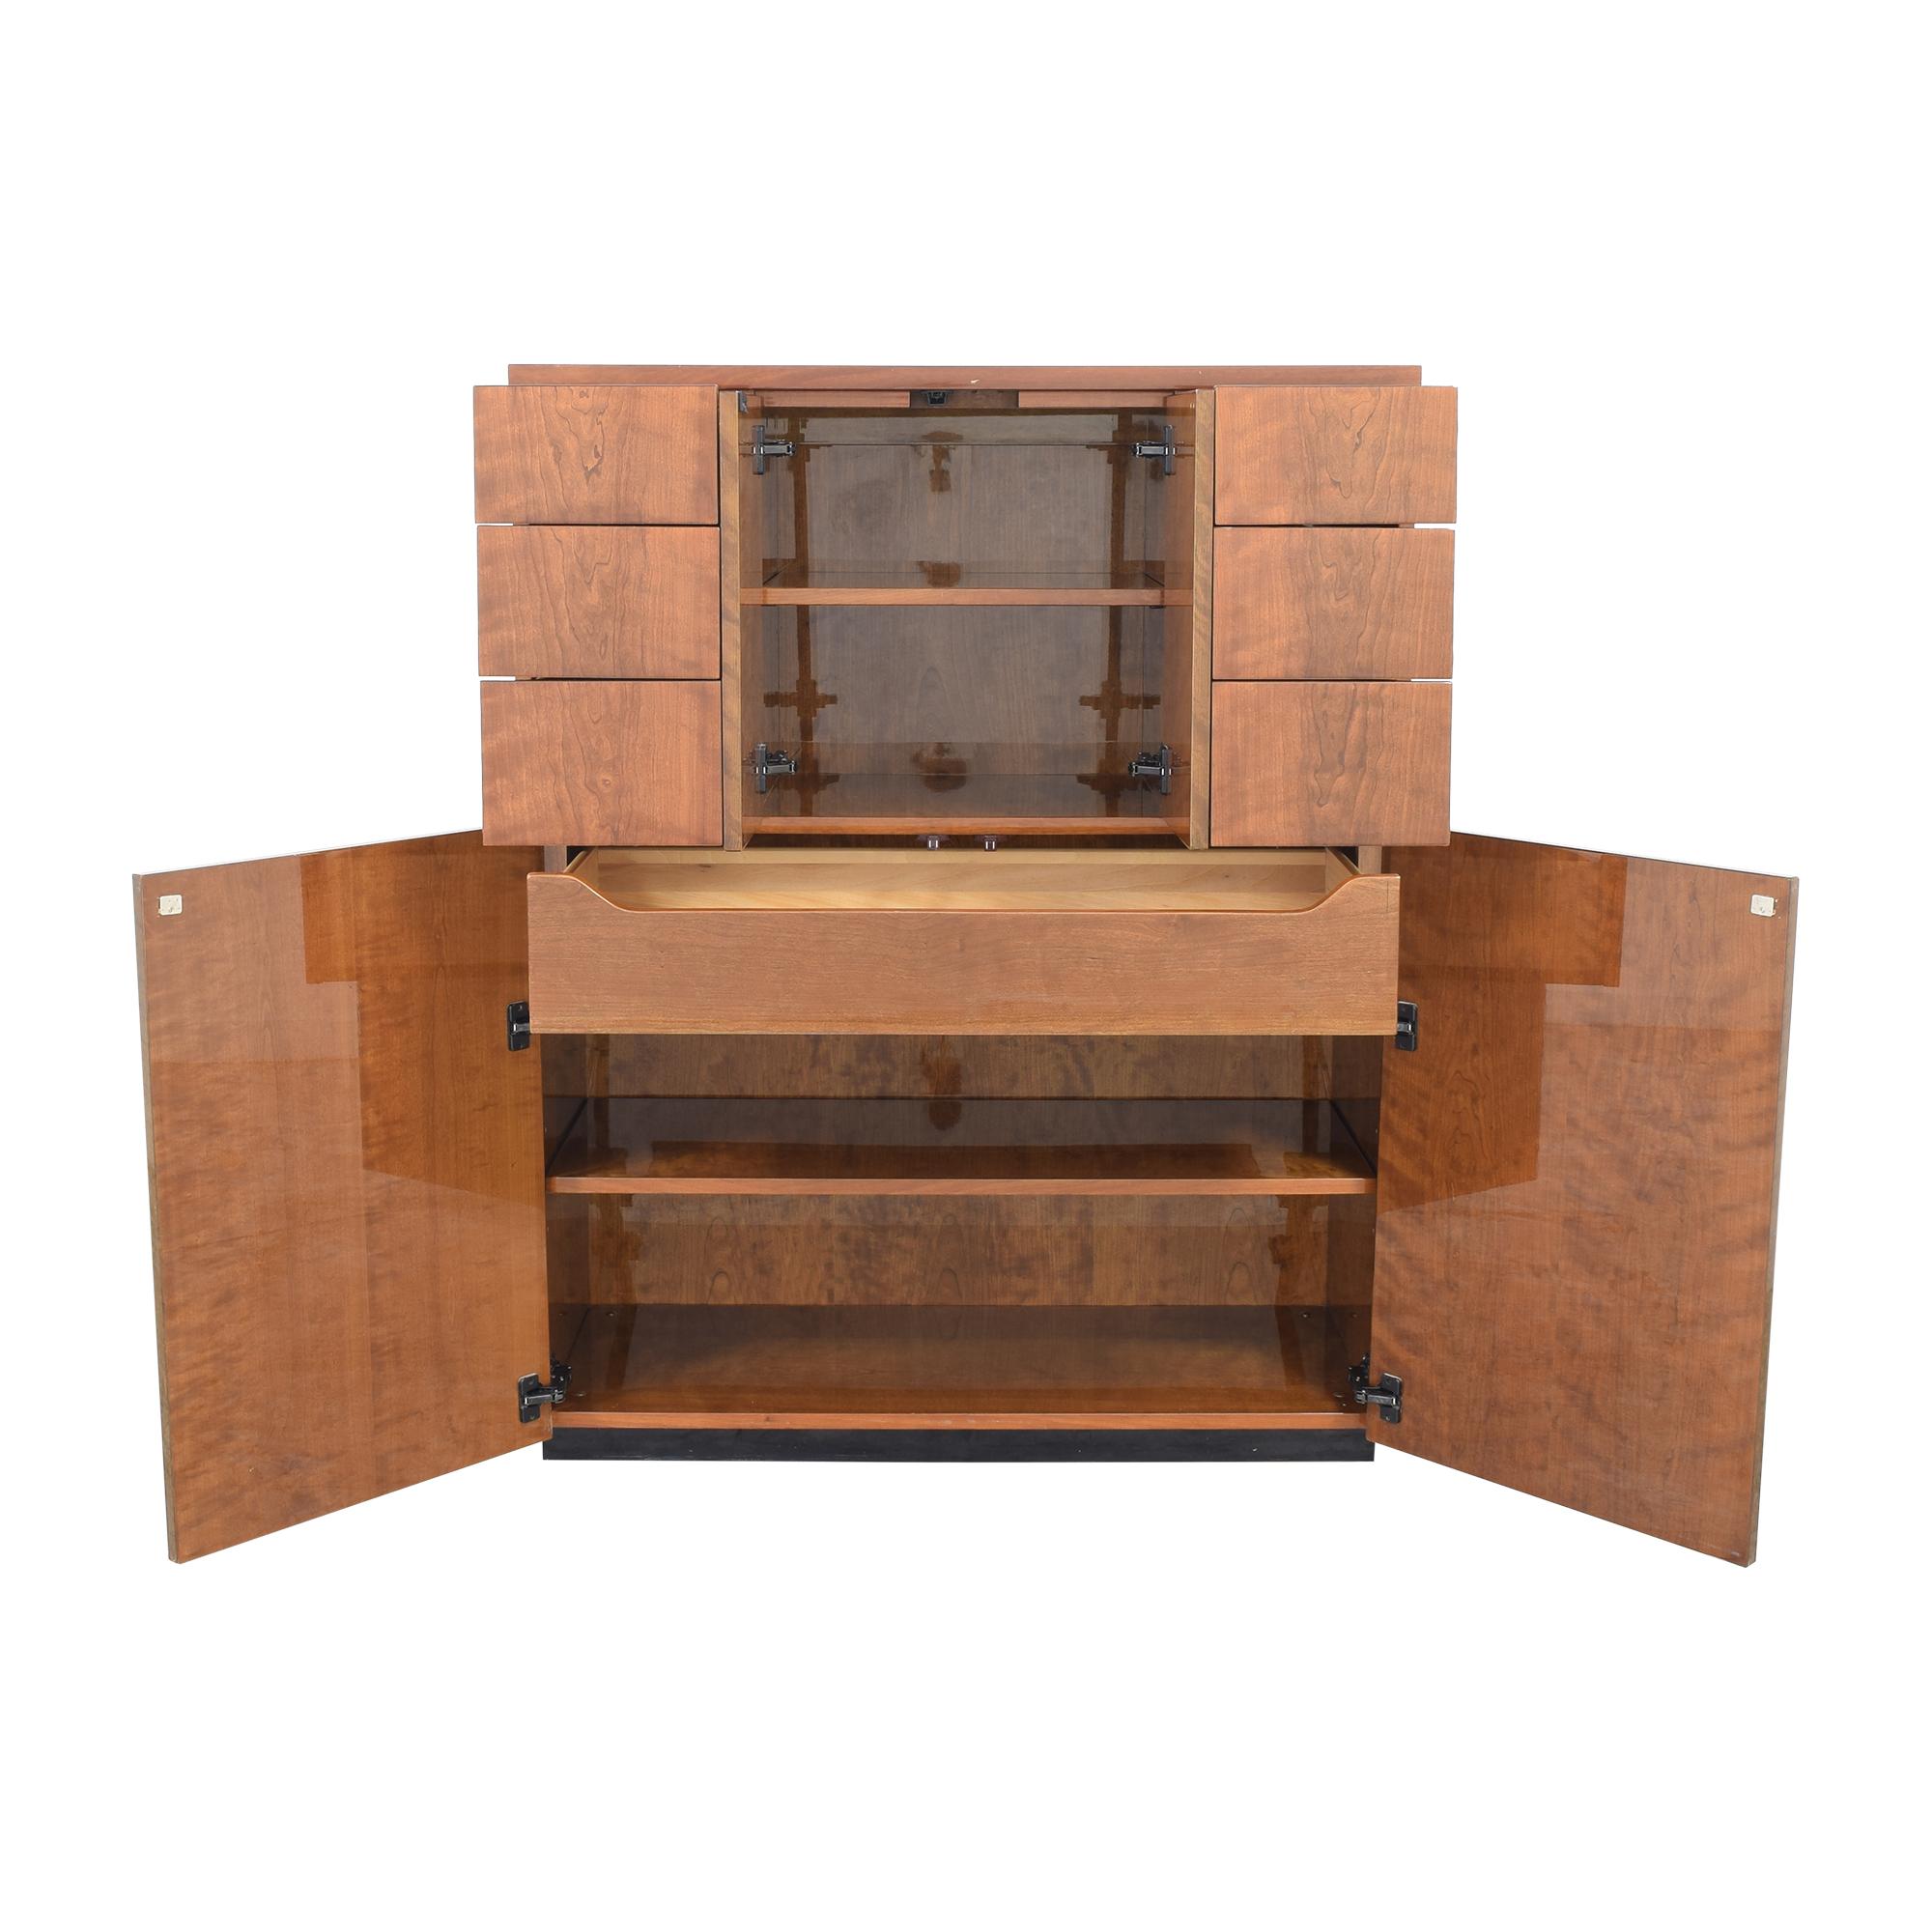 Henredon Furniture Henredon Furniture Storage Chest on sale